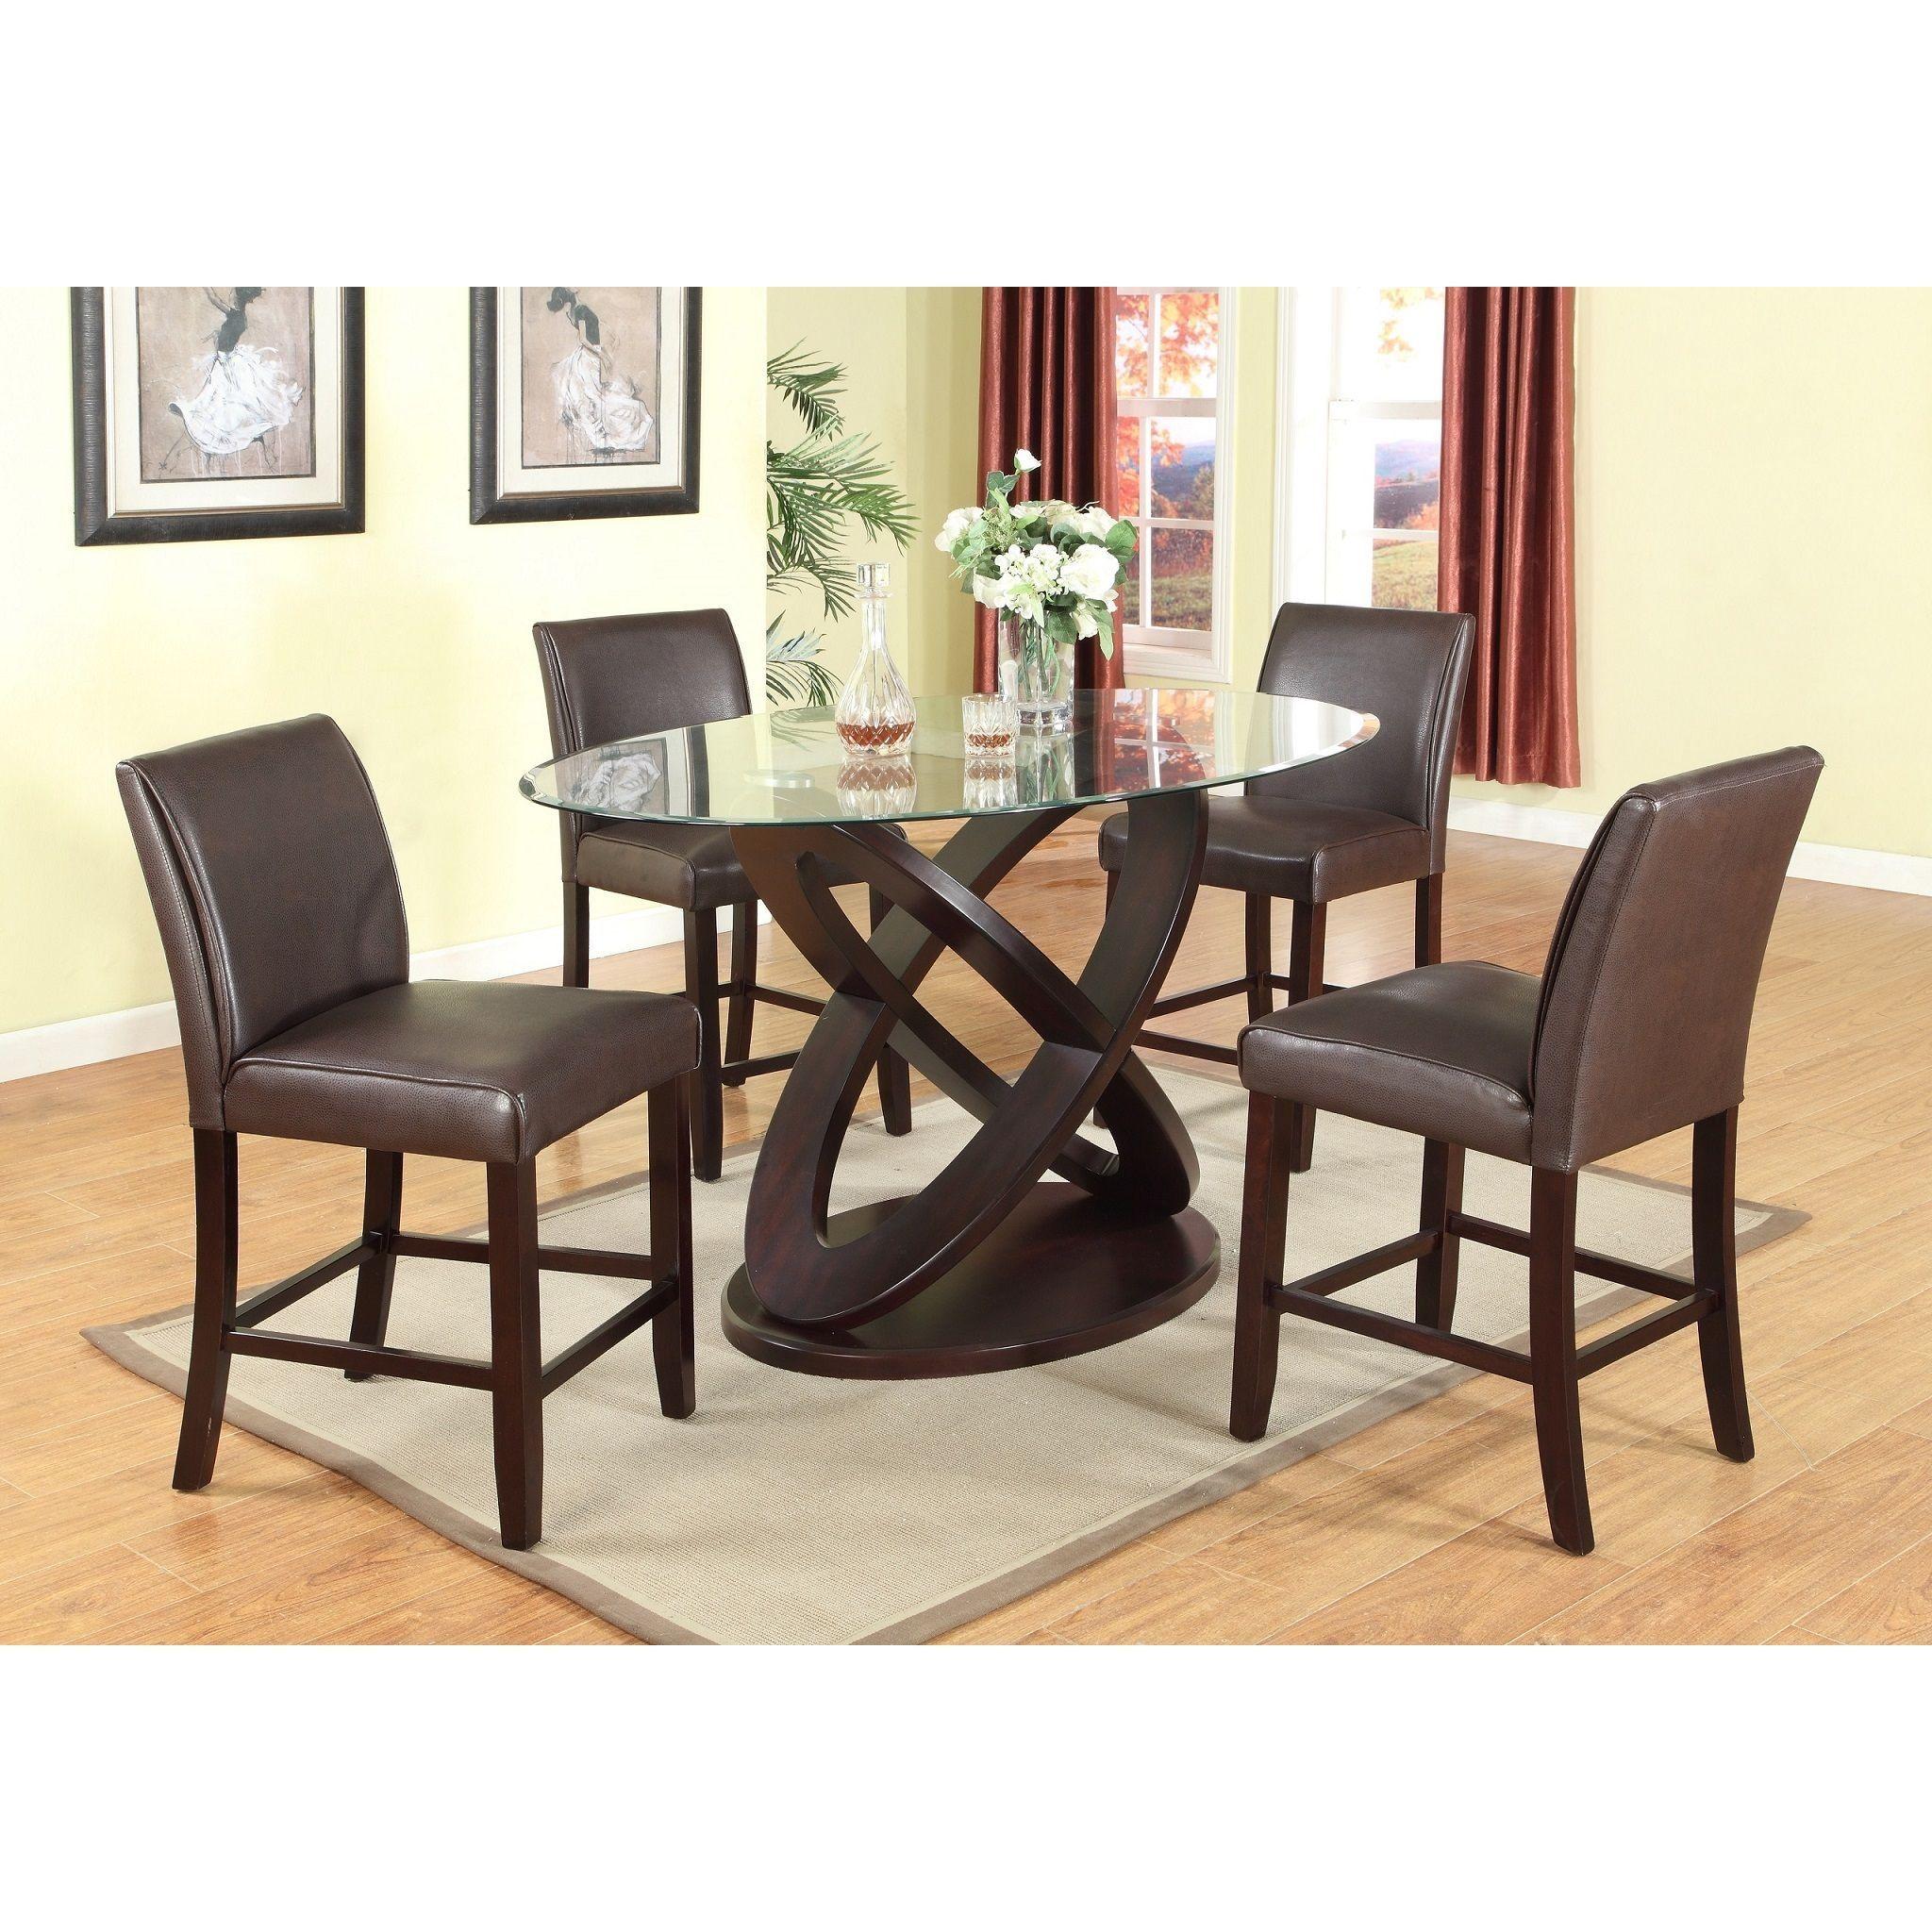 Fine 5 Piece Modern Counter Height In Dark Brown With Glass Inzonedesignstudio Interior Chair Design Inzonedesignstudiocom